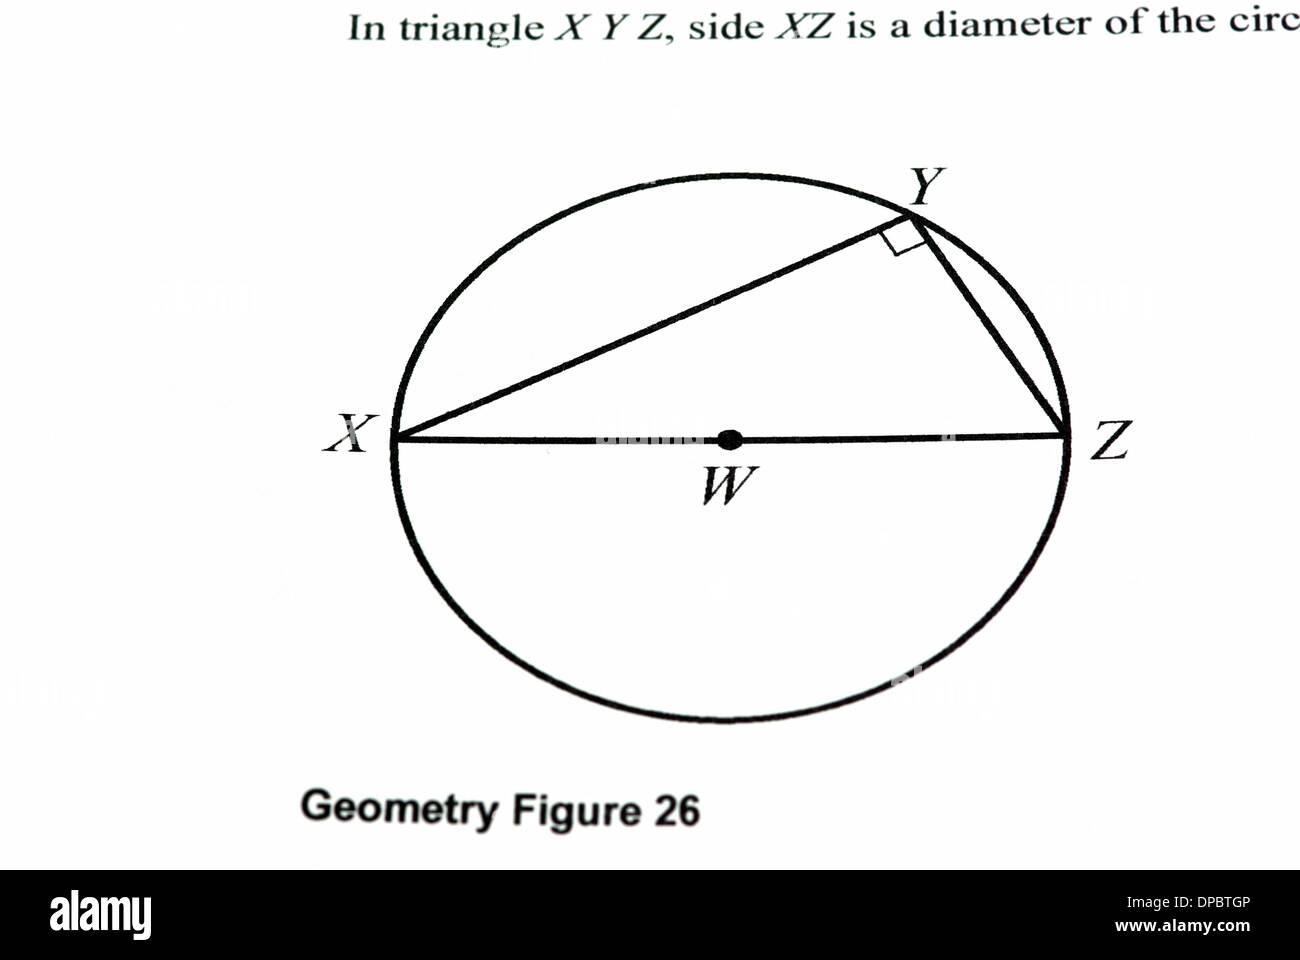 Mathematics graph on a white paper, closeup image - Stock Image